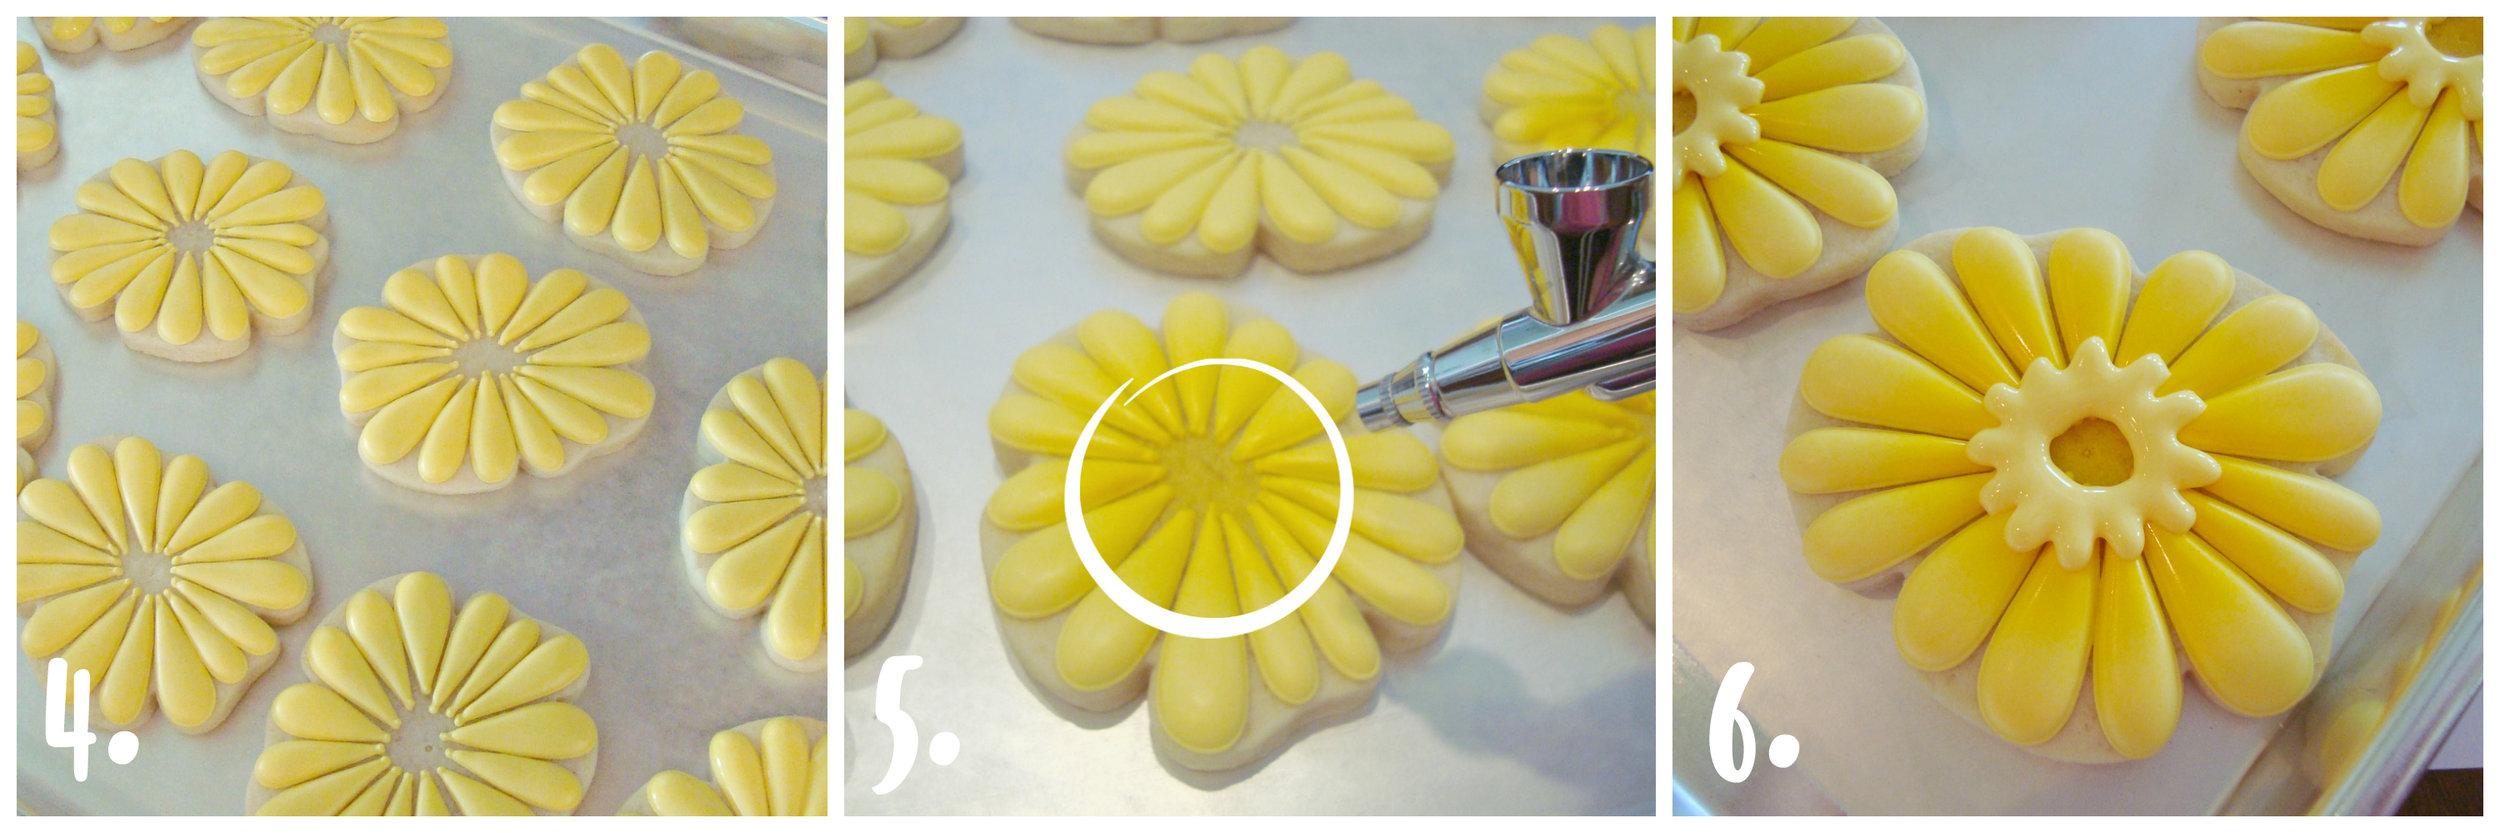 blyss daisies 3.jpg